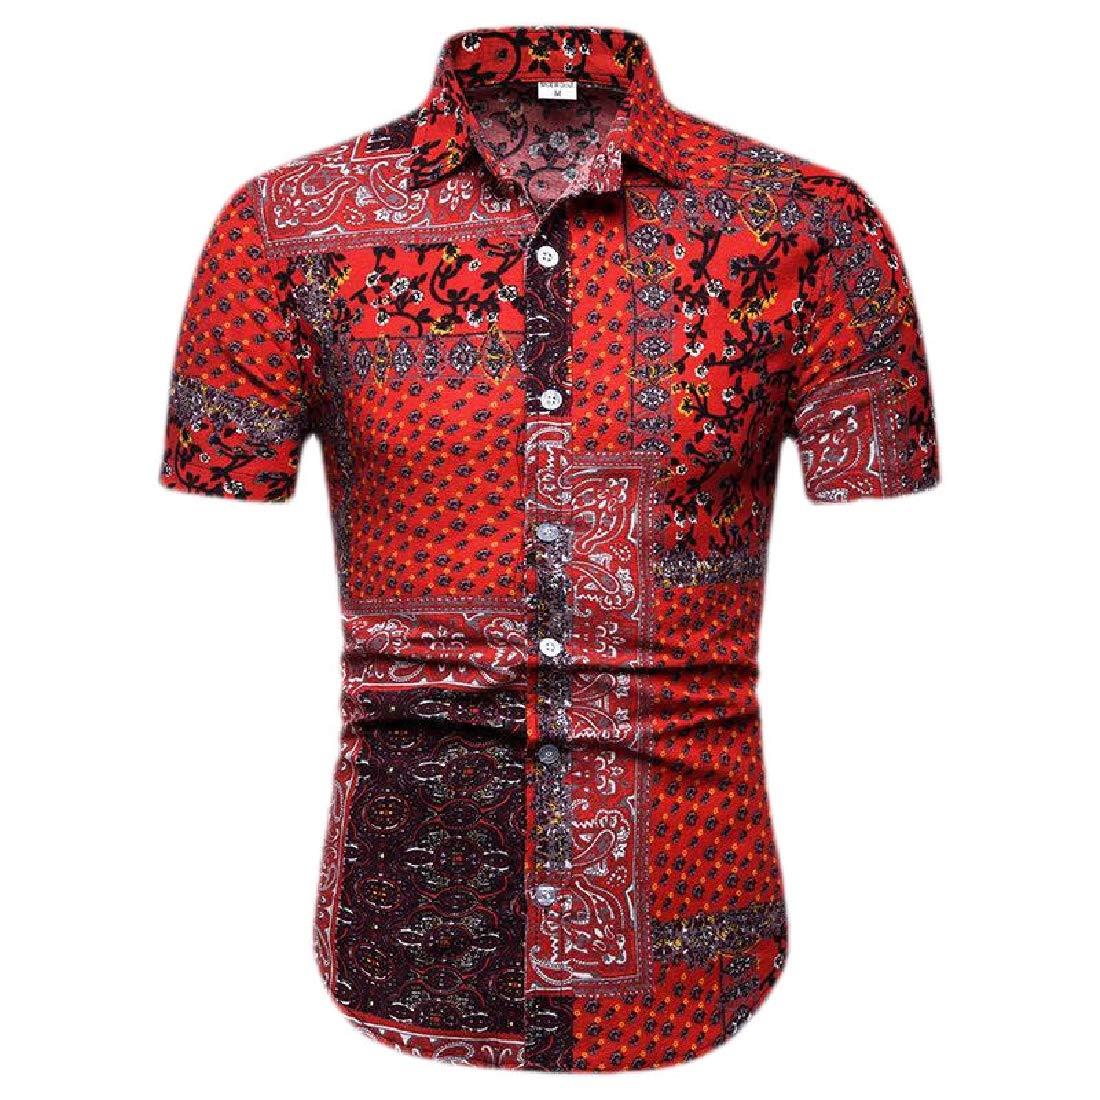 Fubotevic Men Casual Short Sleeve Beach Print Ethnic Style Shirt Blouse Top